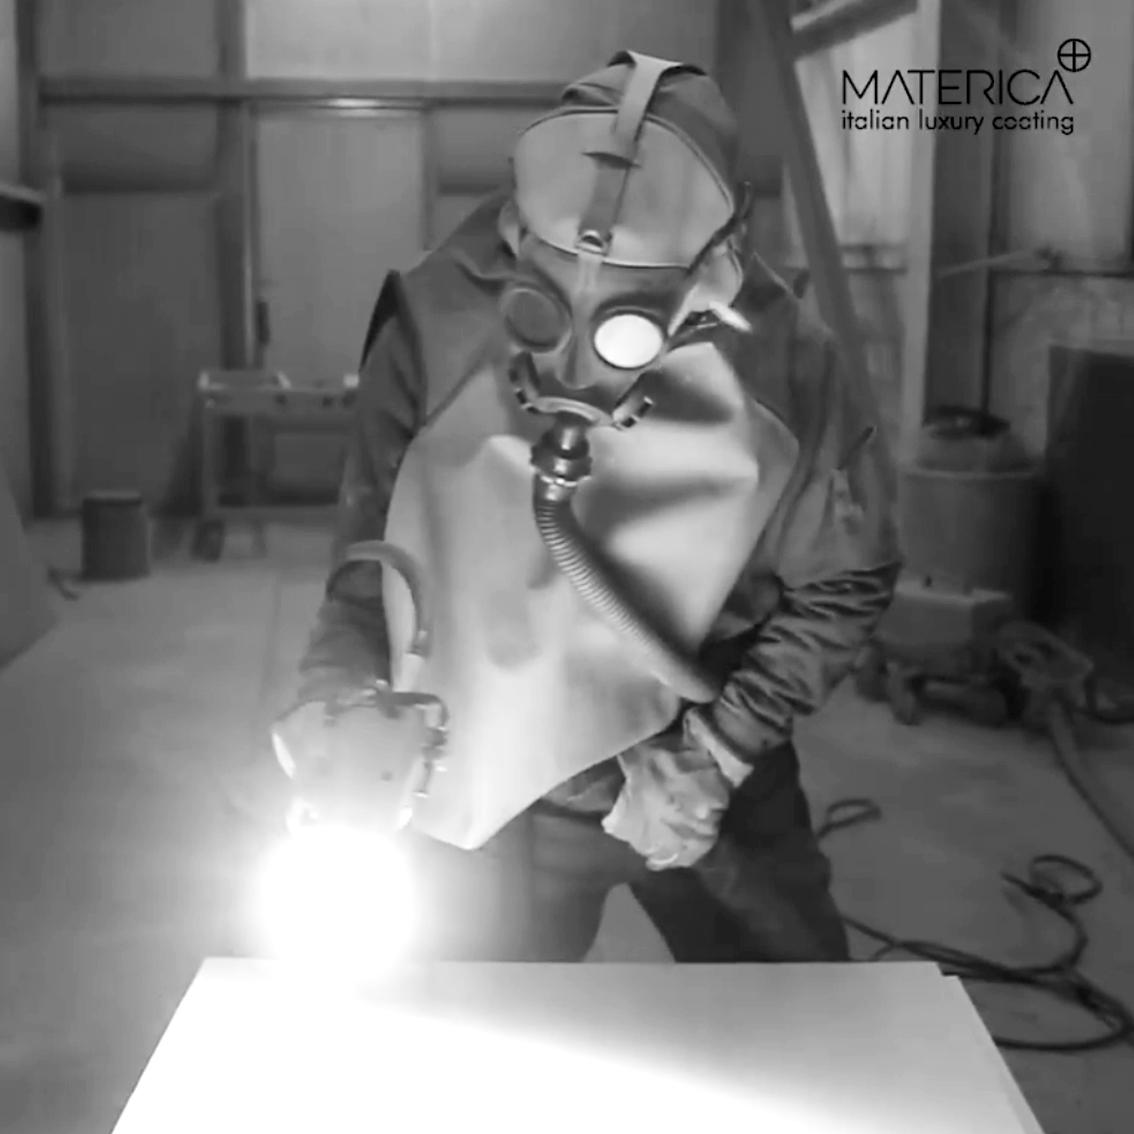 Materica_5_arc_spray